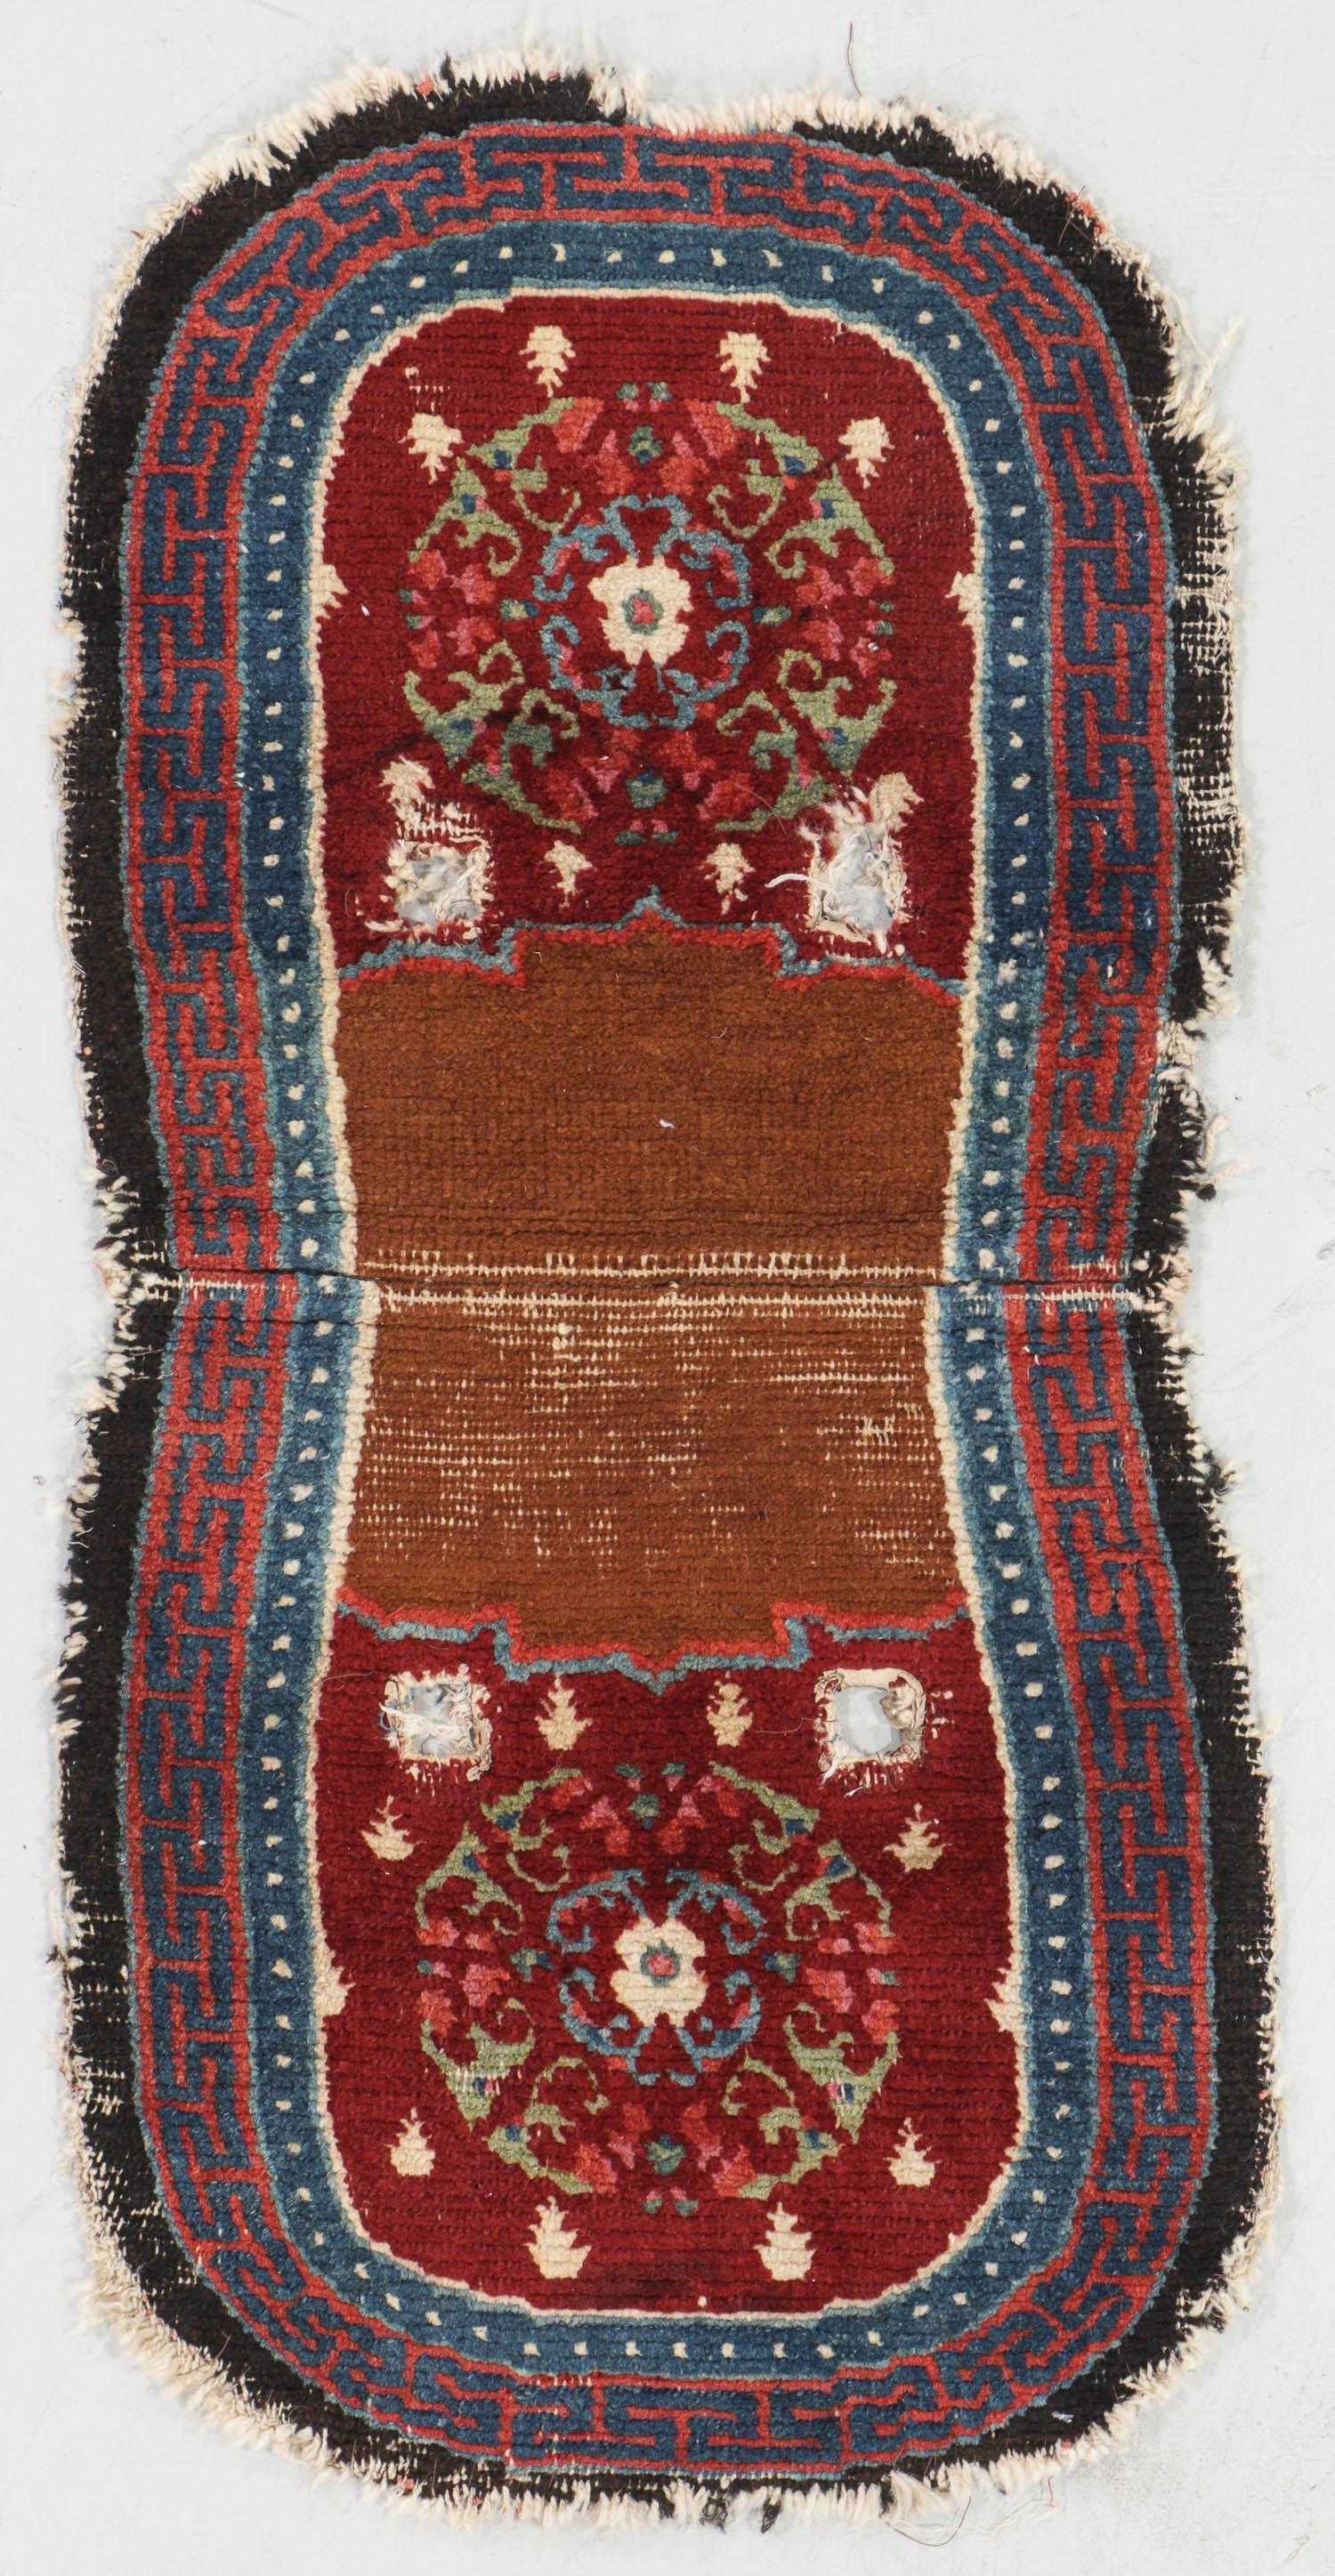 Antique Tibetan Saddle Rug, Tibet, Late 19th c